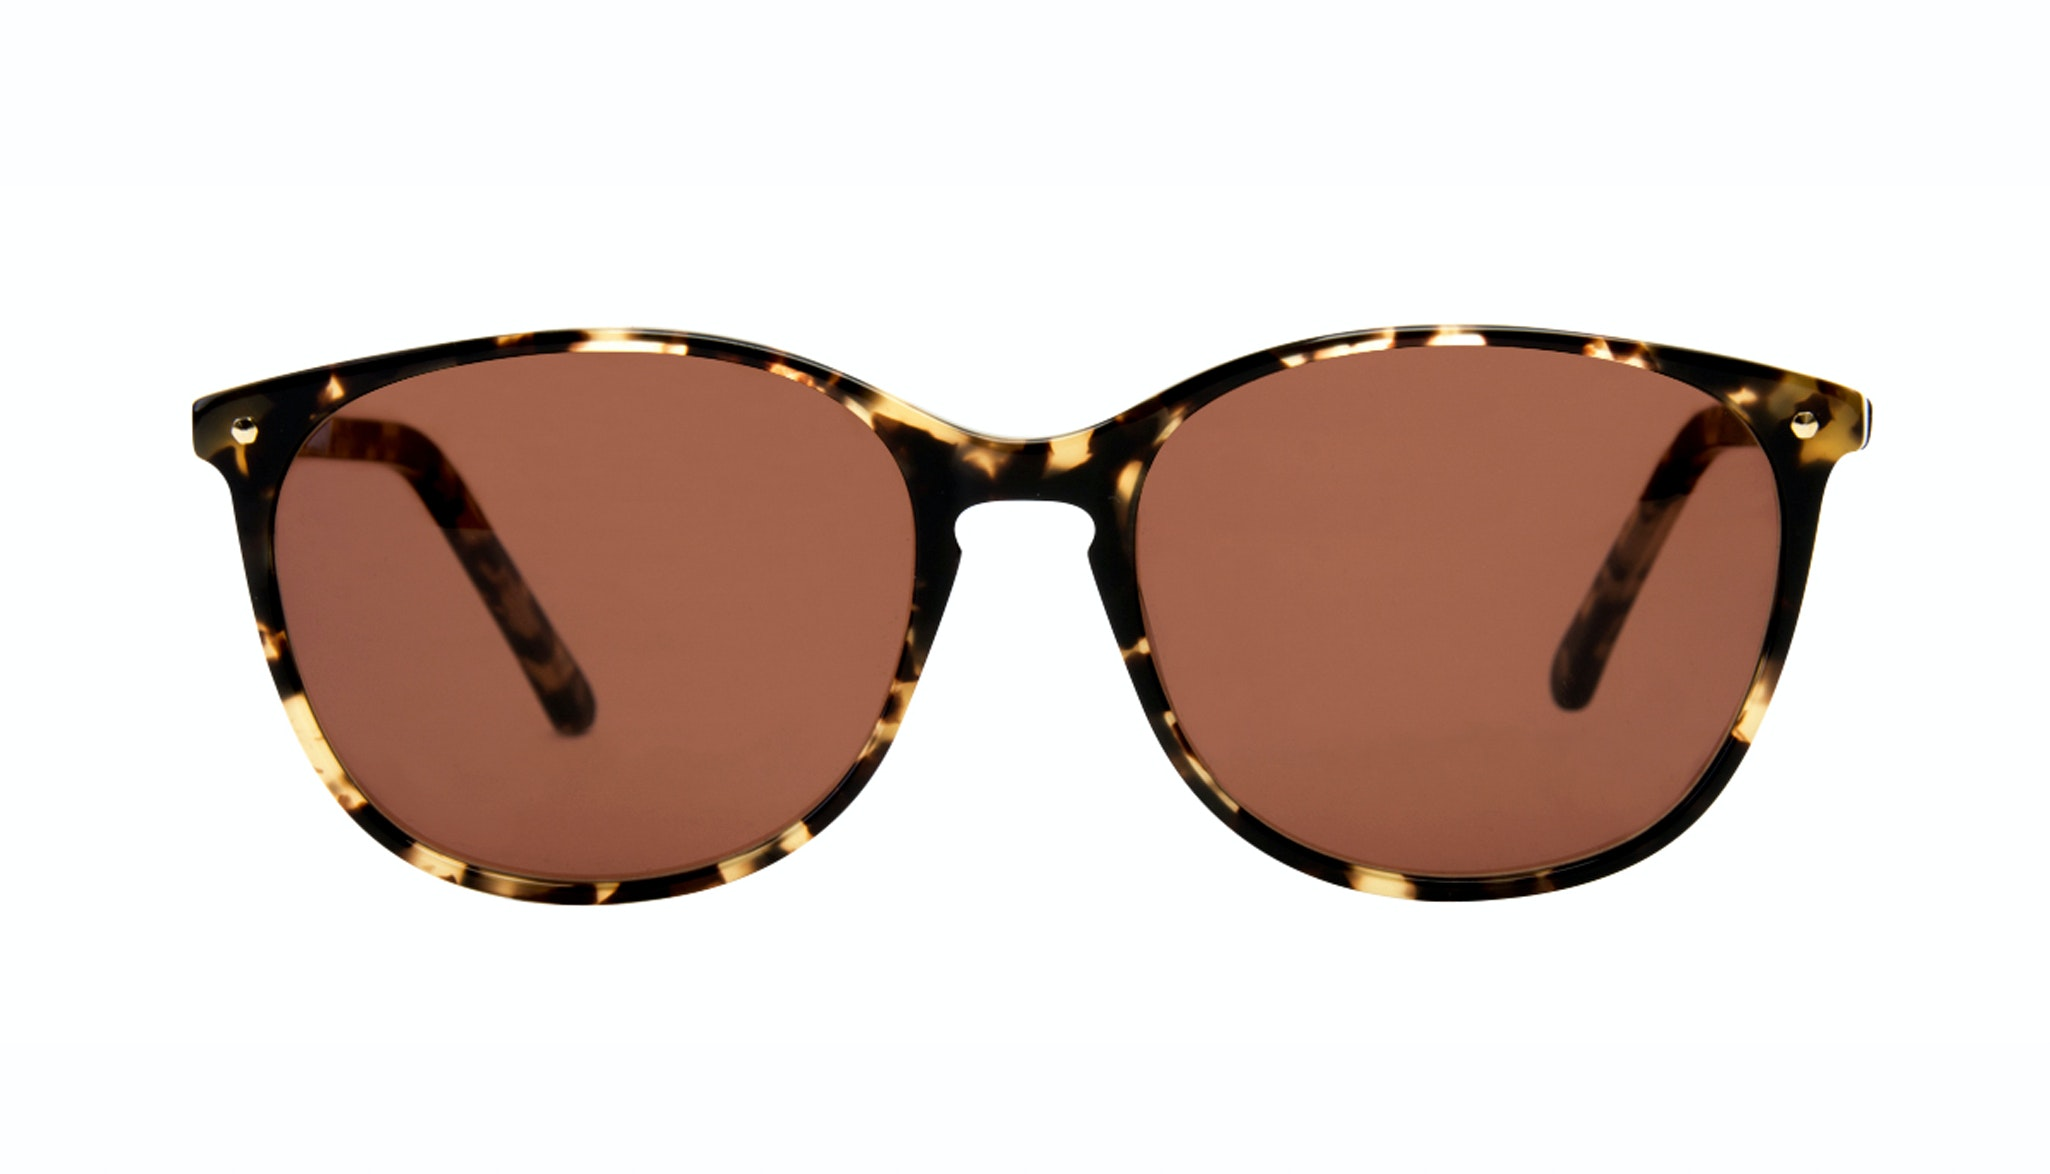 Affordable Fashion Glasses Rectangle Square Round Sunglasses Women Nadine Bingal Front